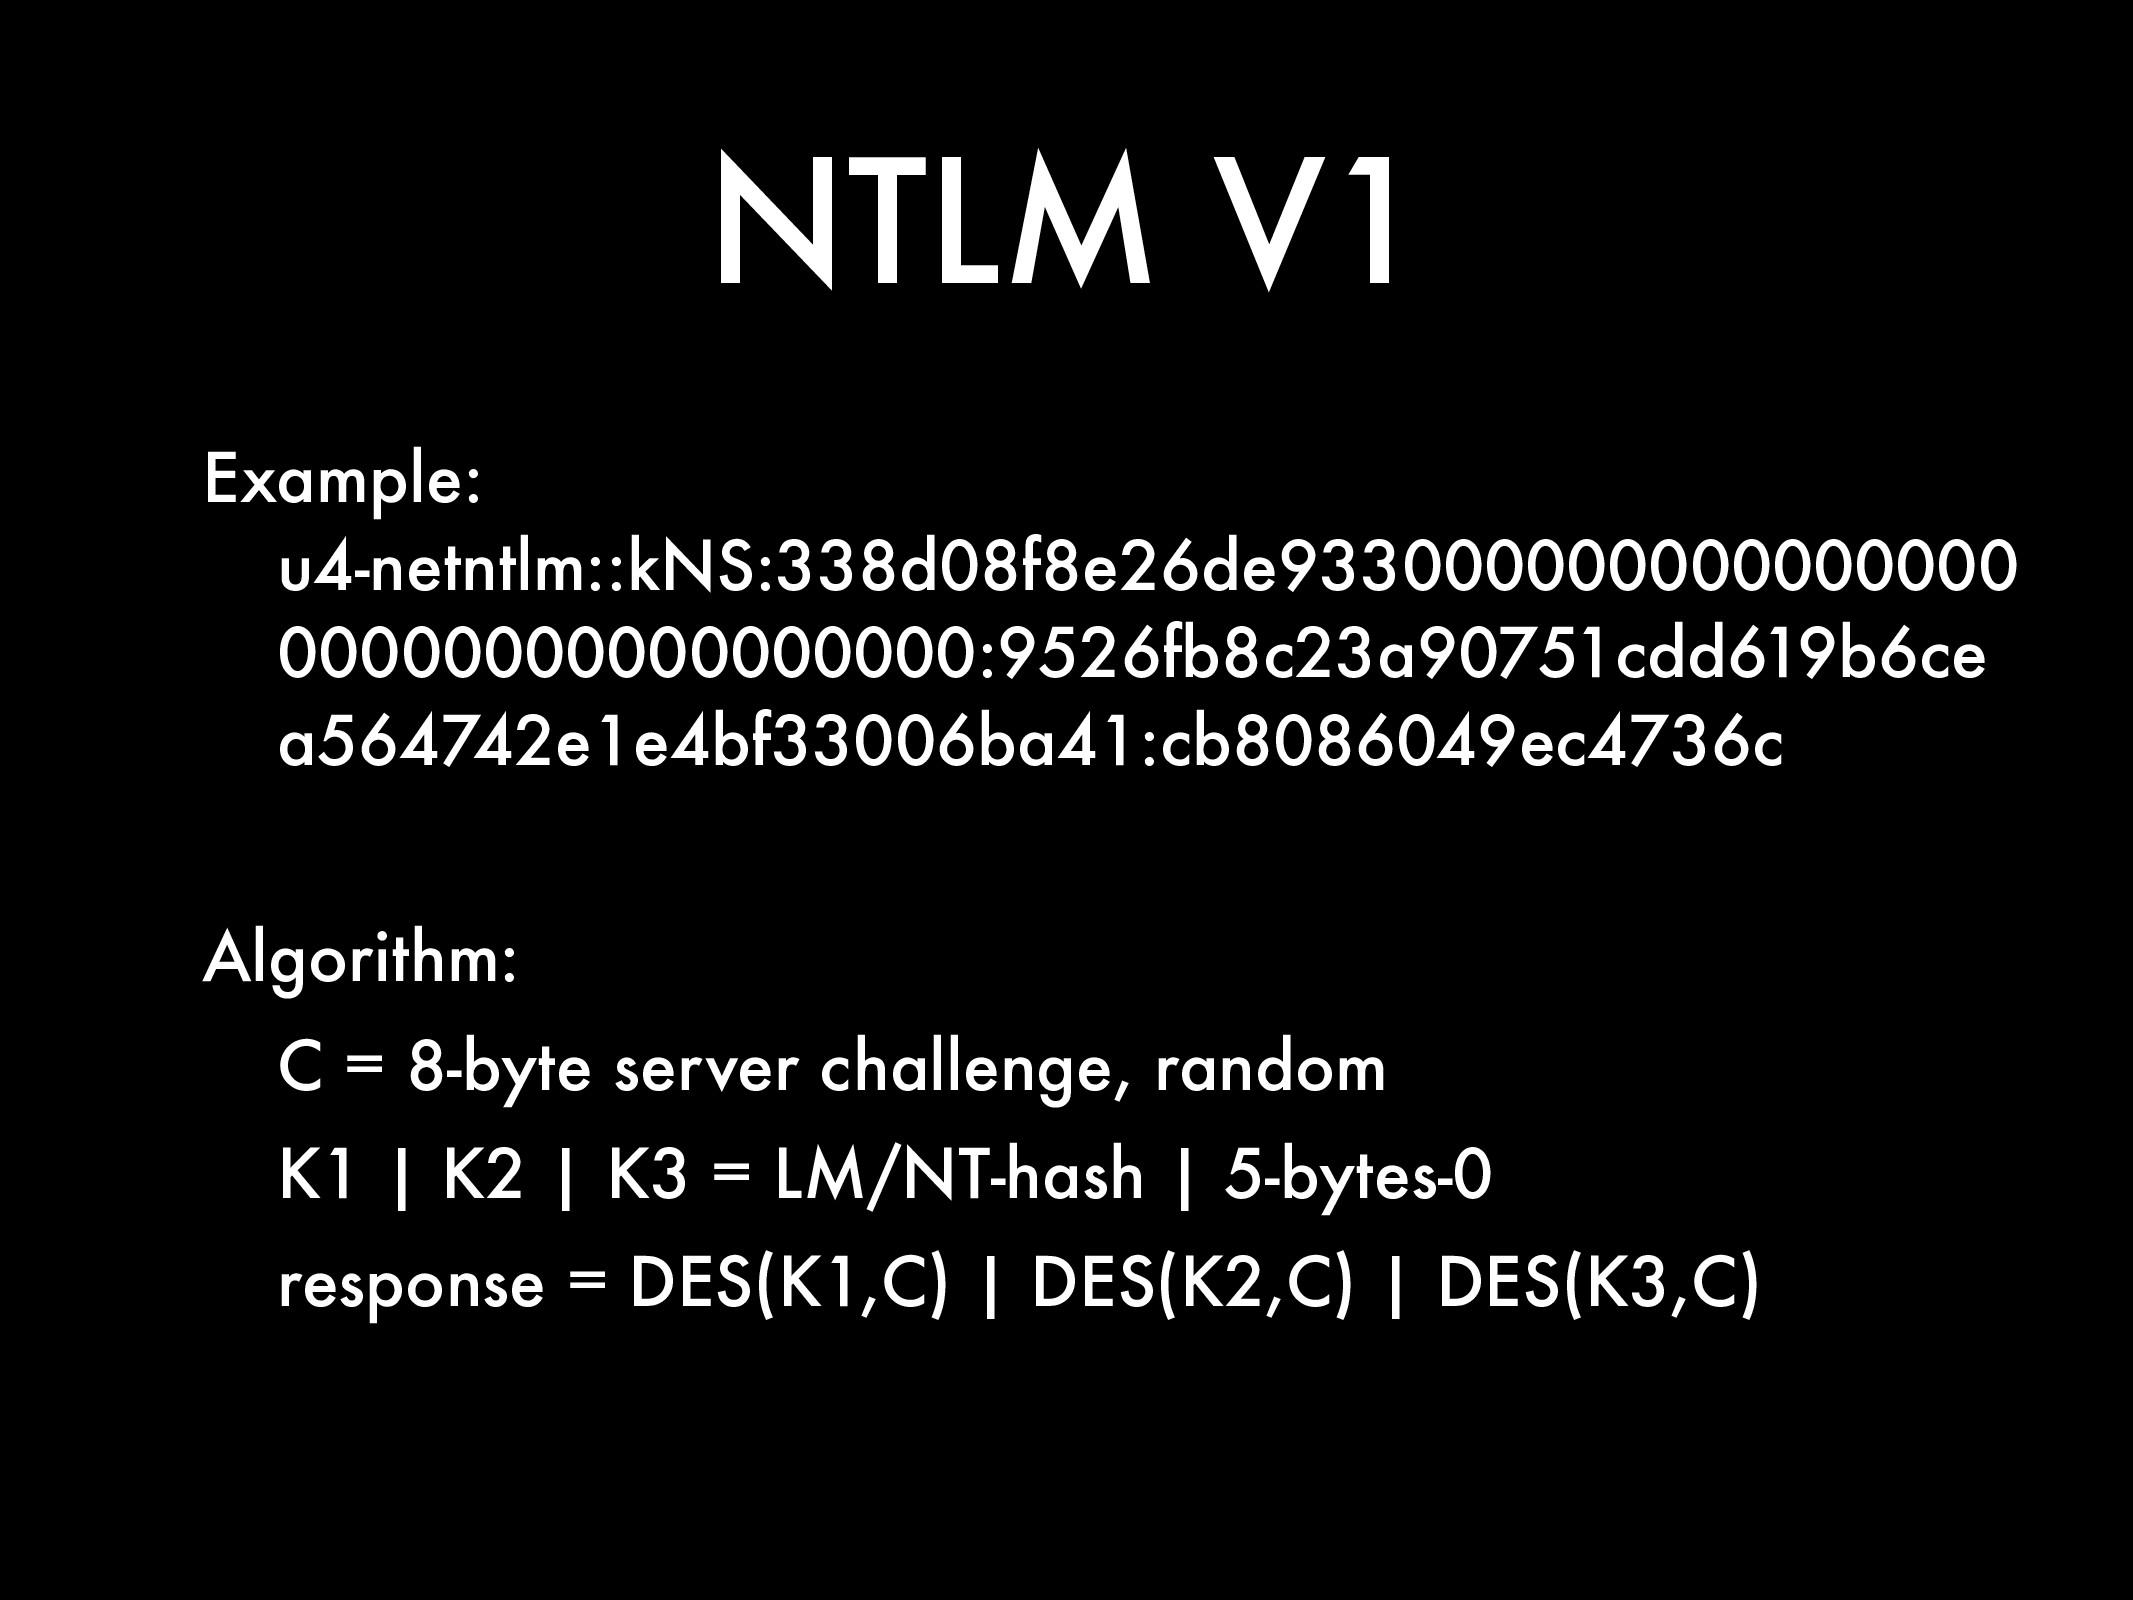 NTLM V1 Example: u4-netntlm::kNS:338d08f8e26de9...